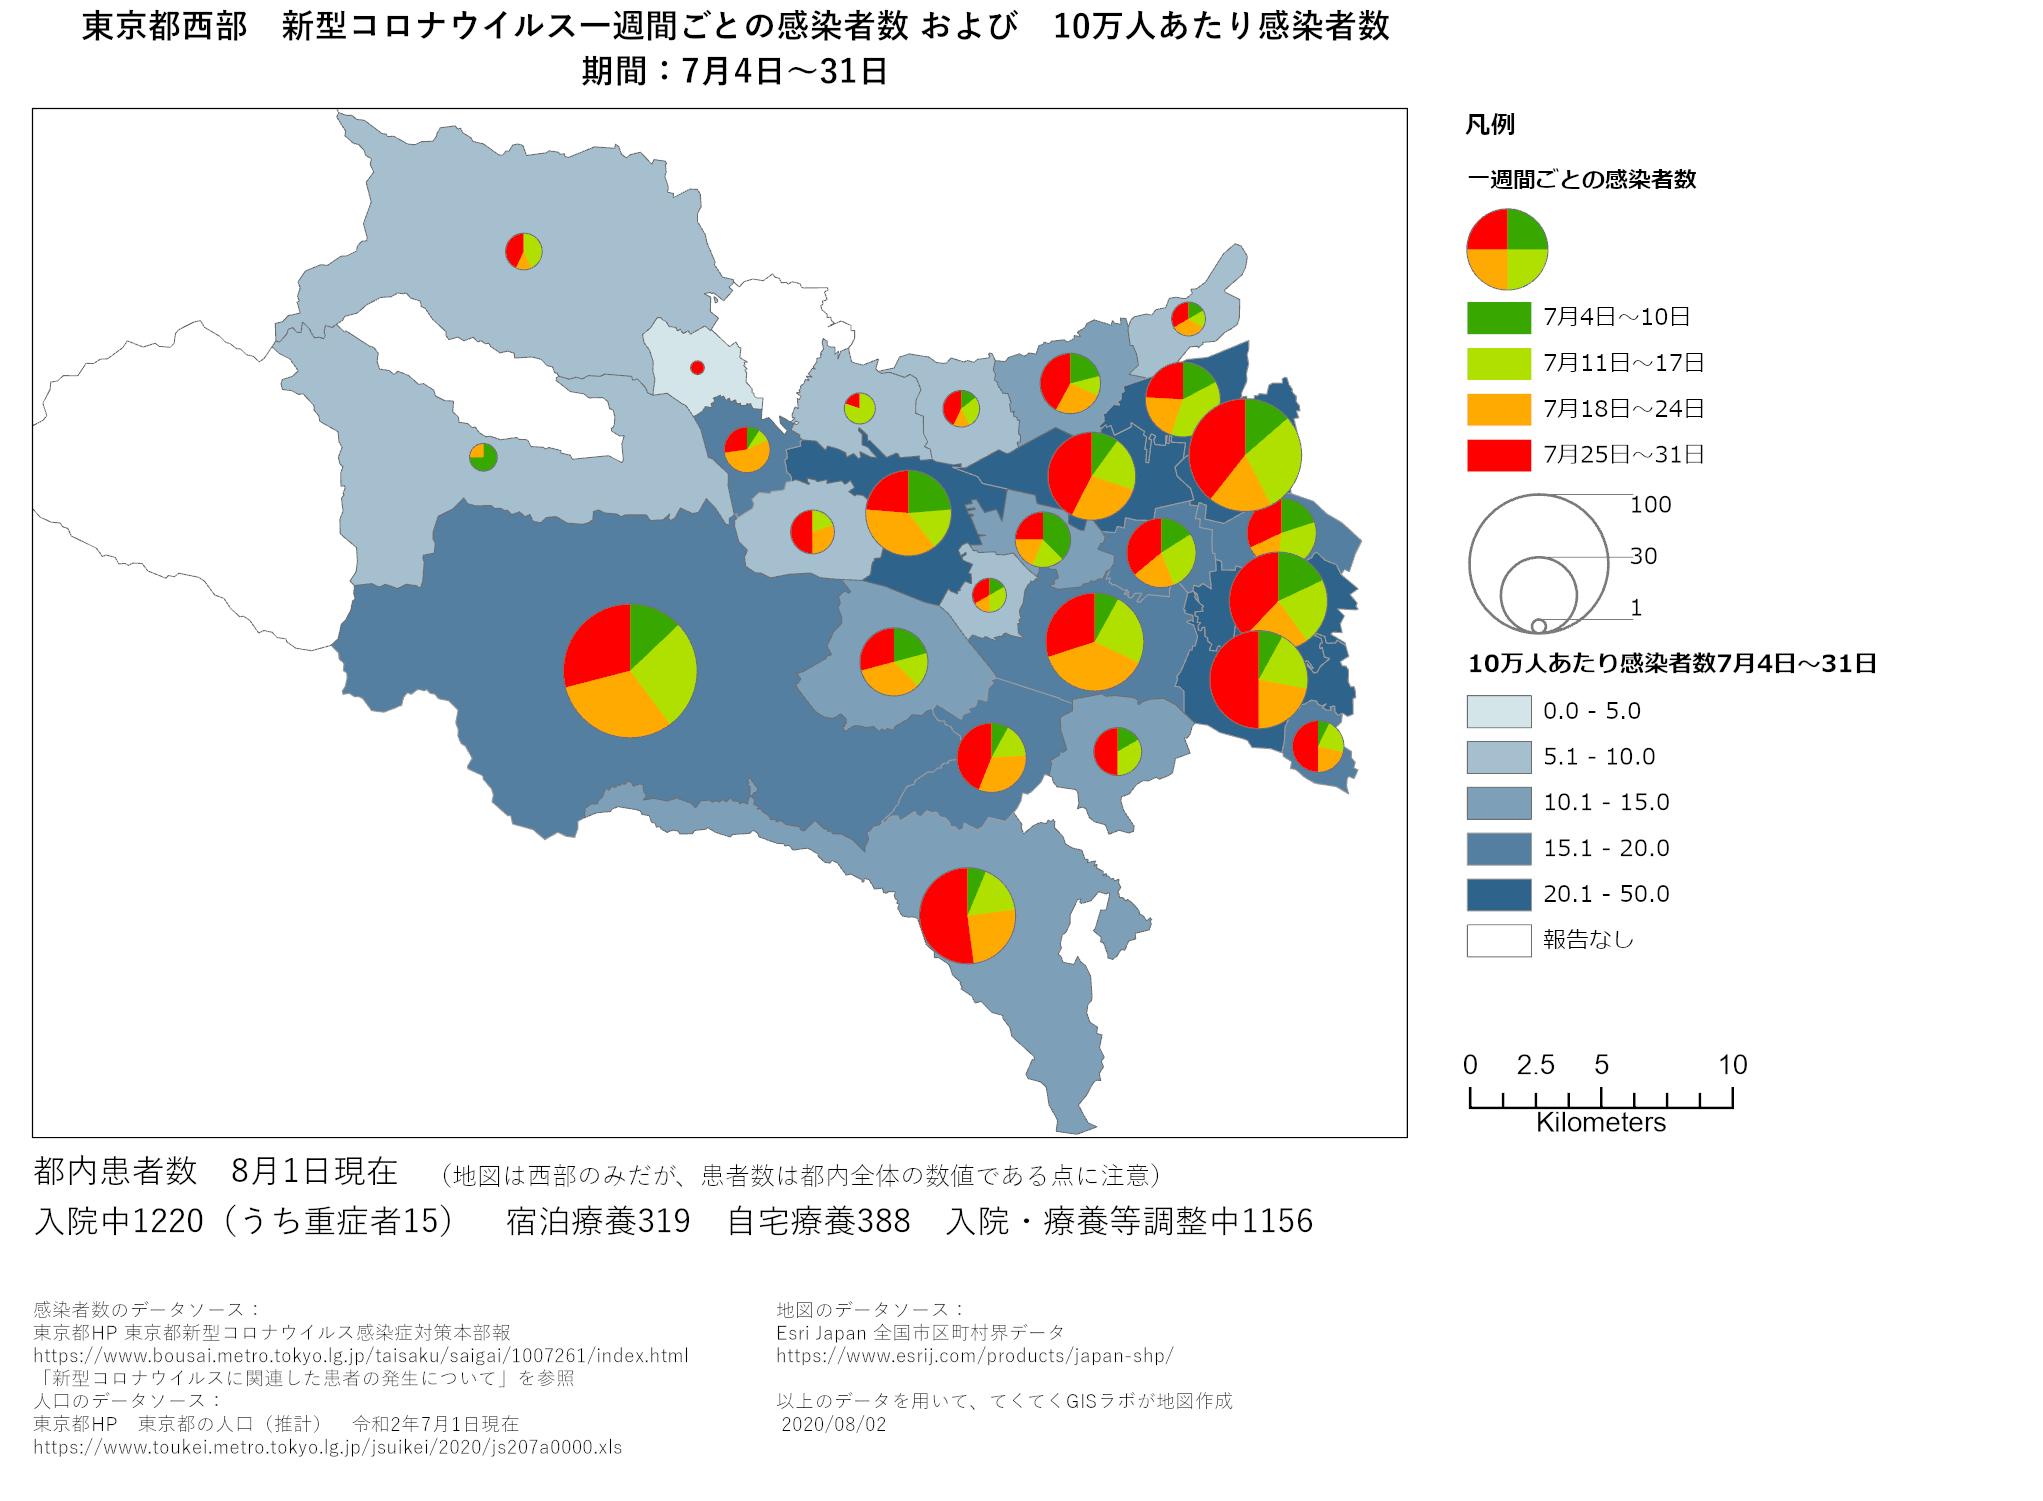 1週間ごと感染者数、東京都、7月4日〜7月31日